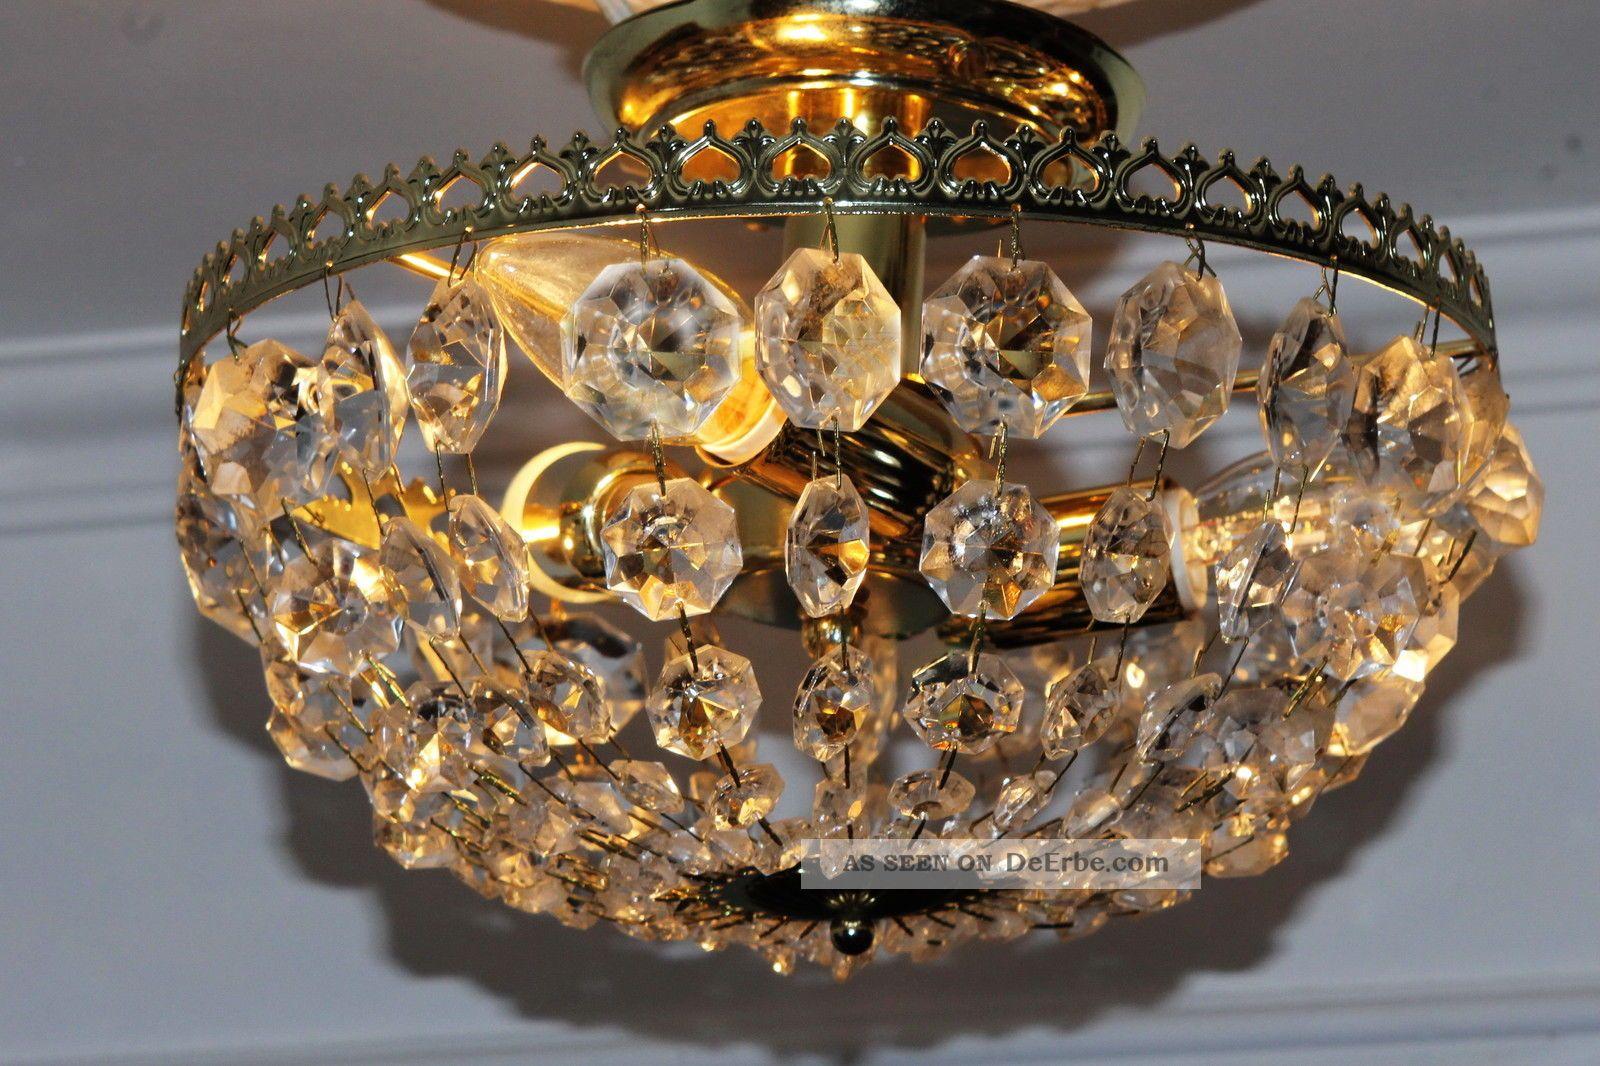 Plafoniere Kristall Antik : Mobiliar interieur lampen leuchten antike originale vor